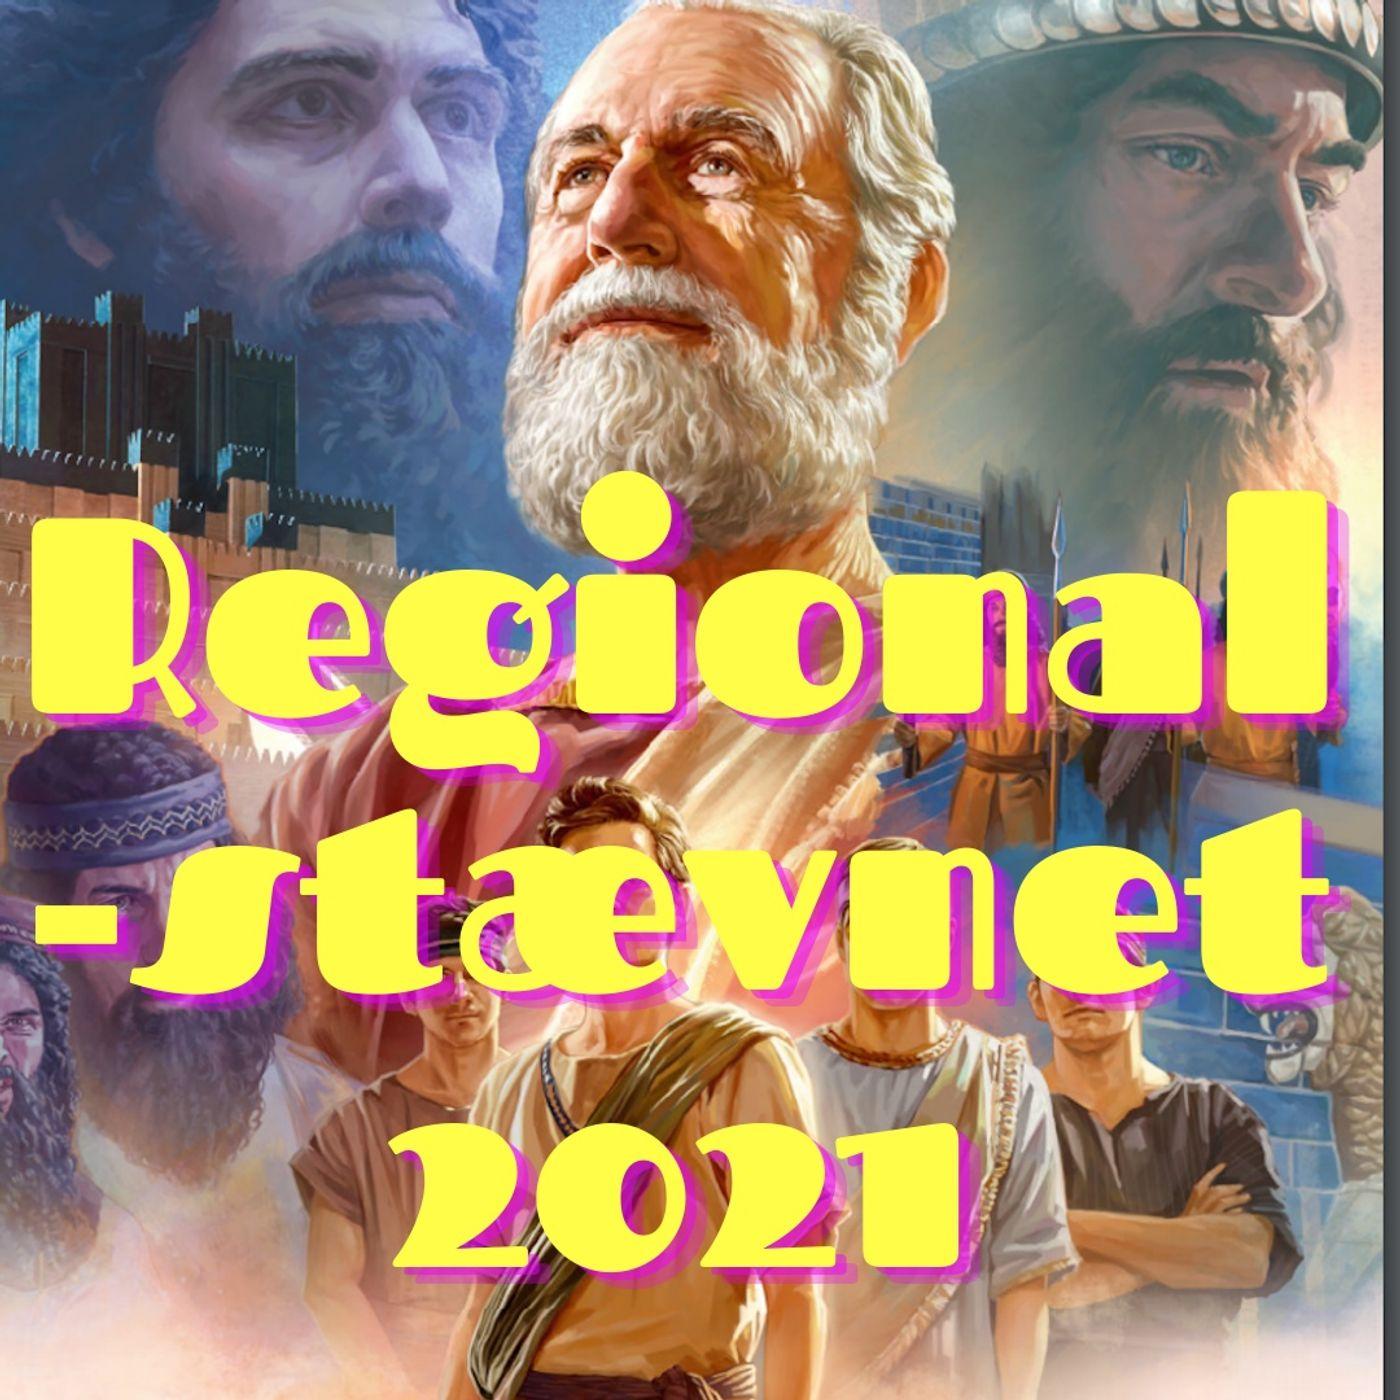 #106 Regionalstævnet 2021